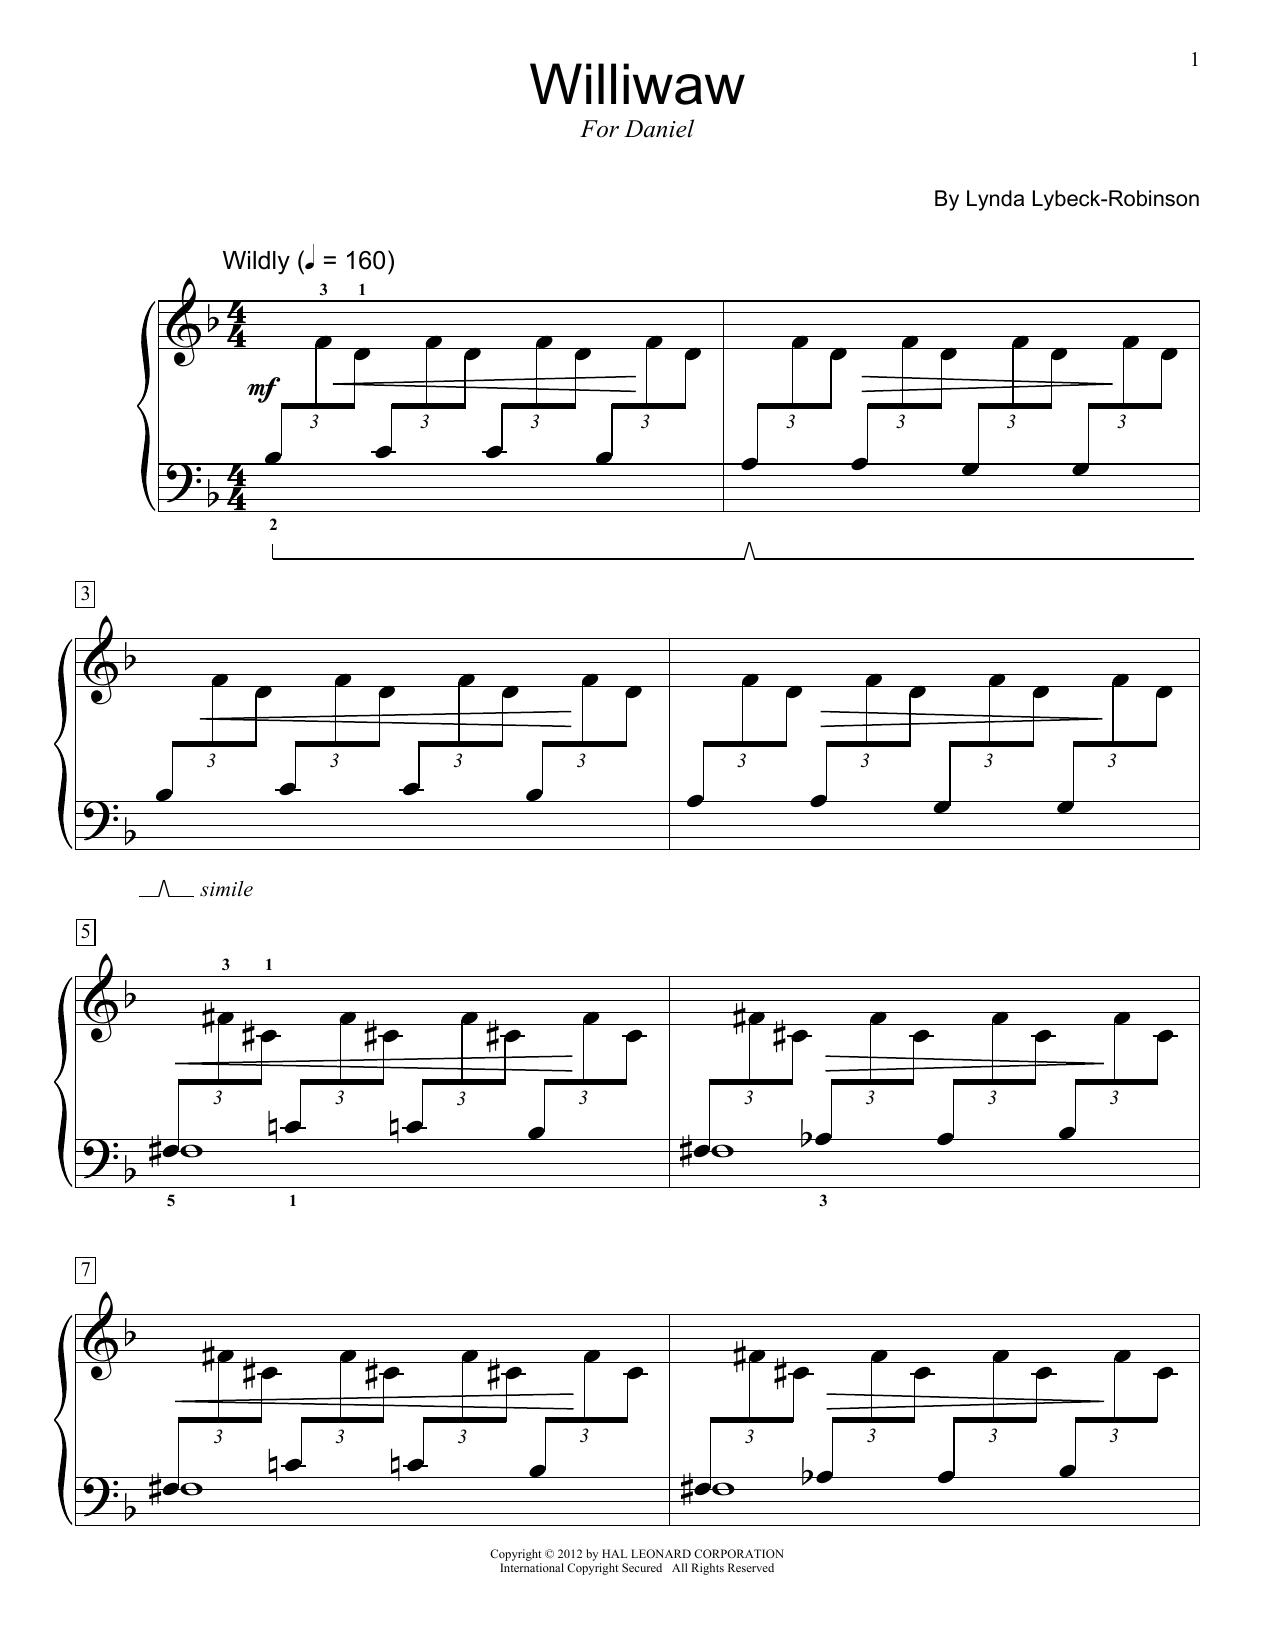 Lynda Lybeck-Robinson Williwaw sheet music notes and chords. Download Printable PDF.